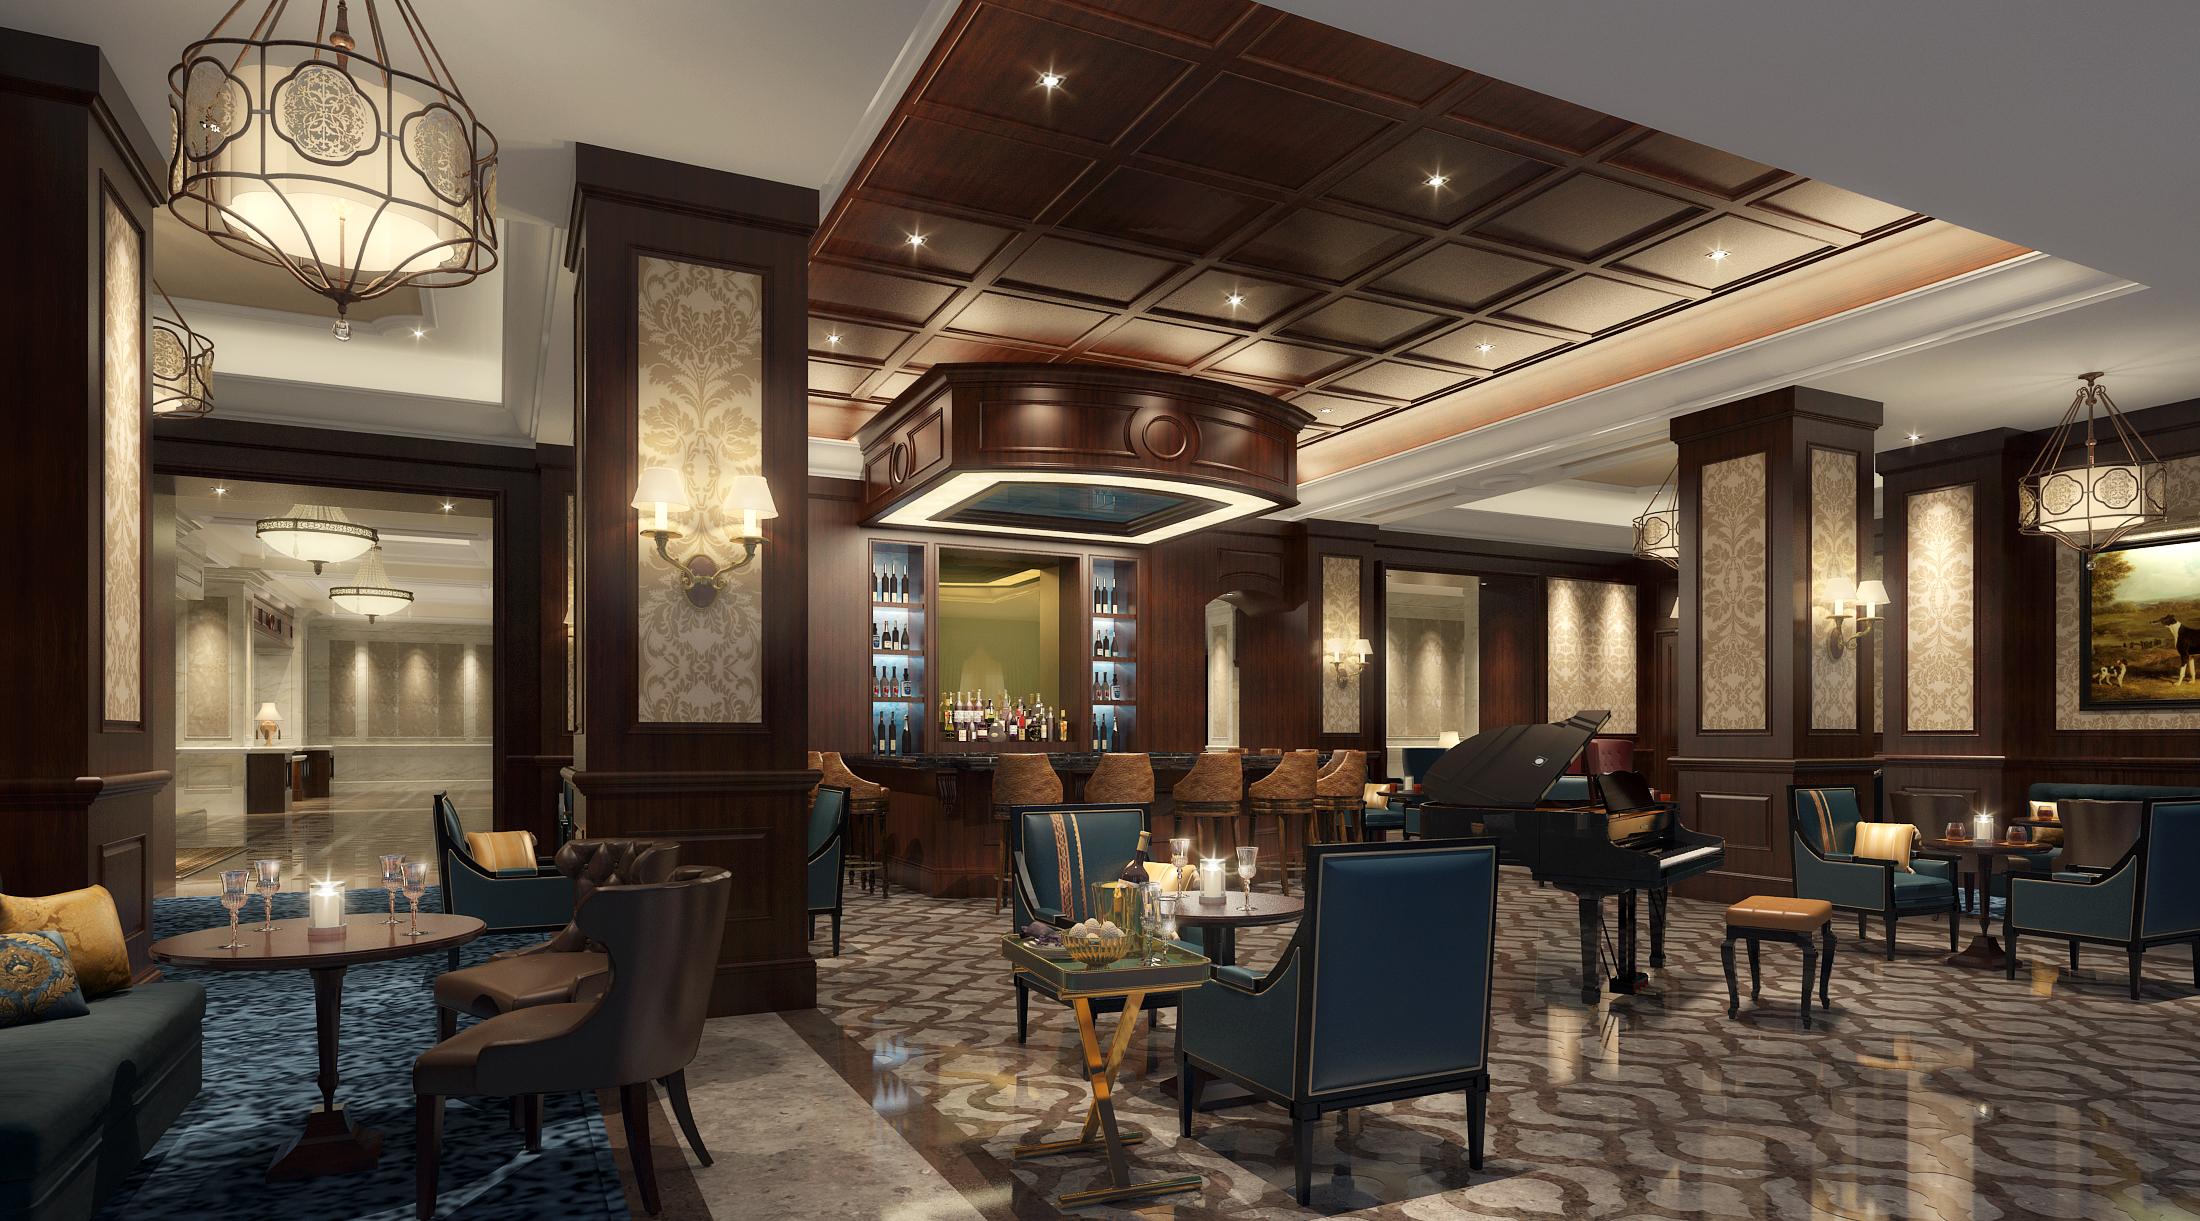 Shandong British Boutique Hotel Lounge2.jpg